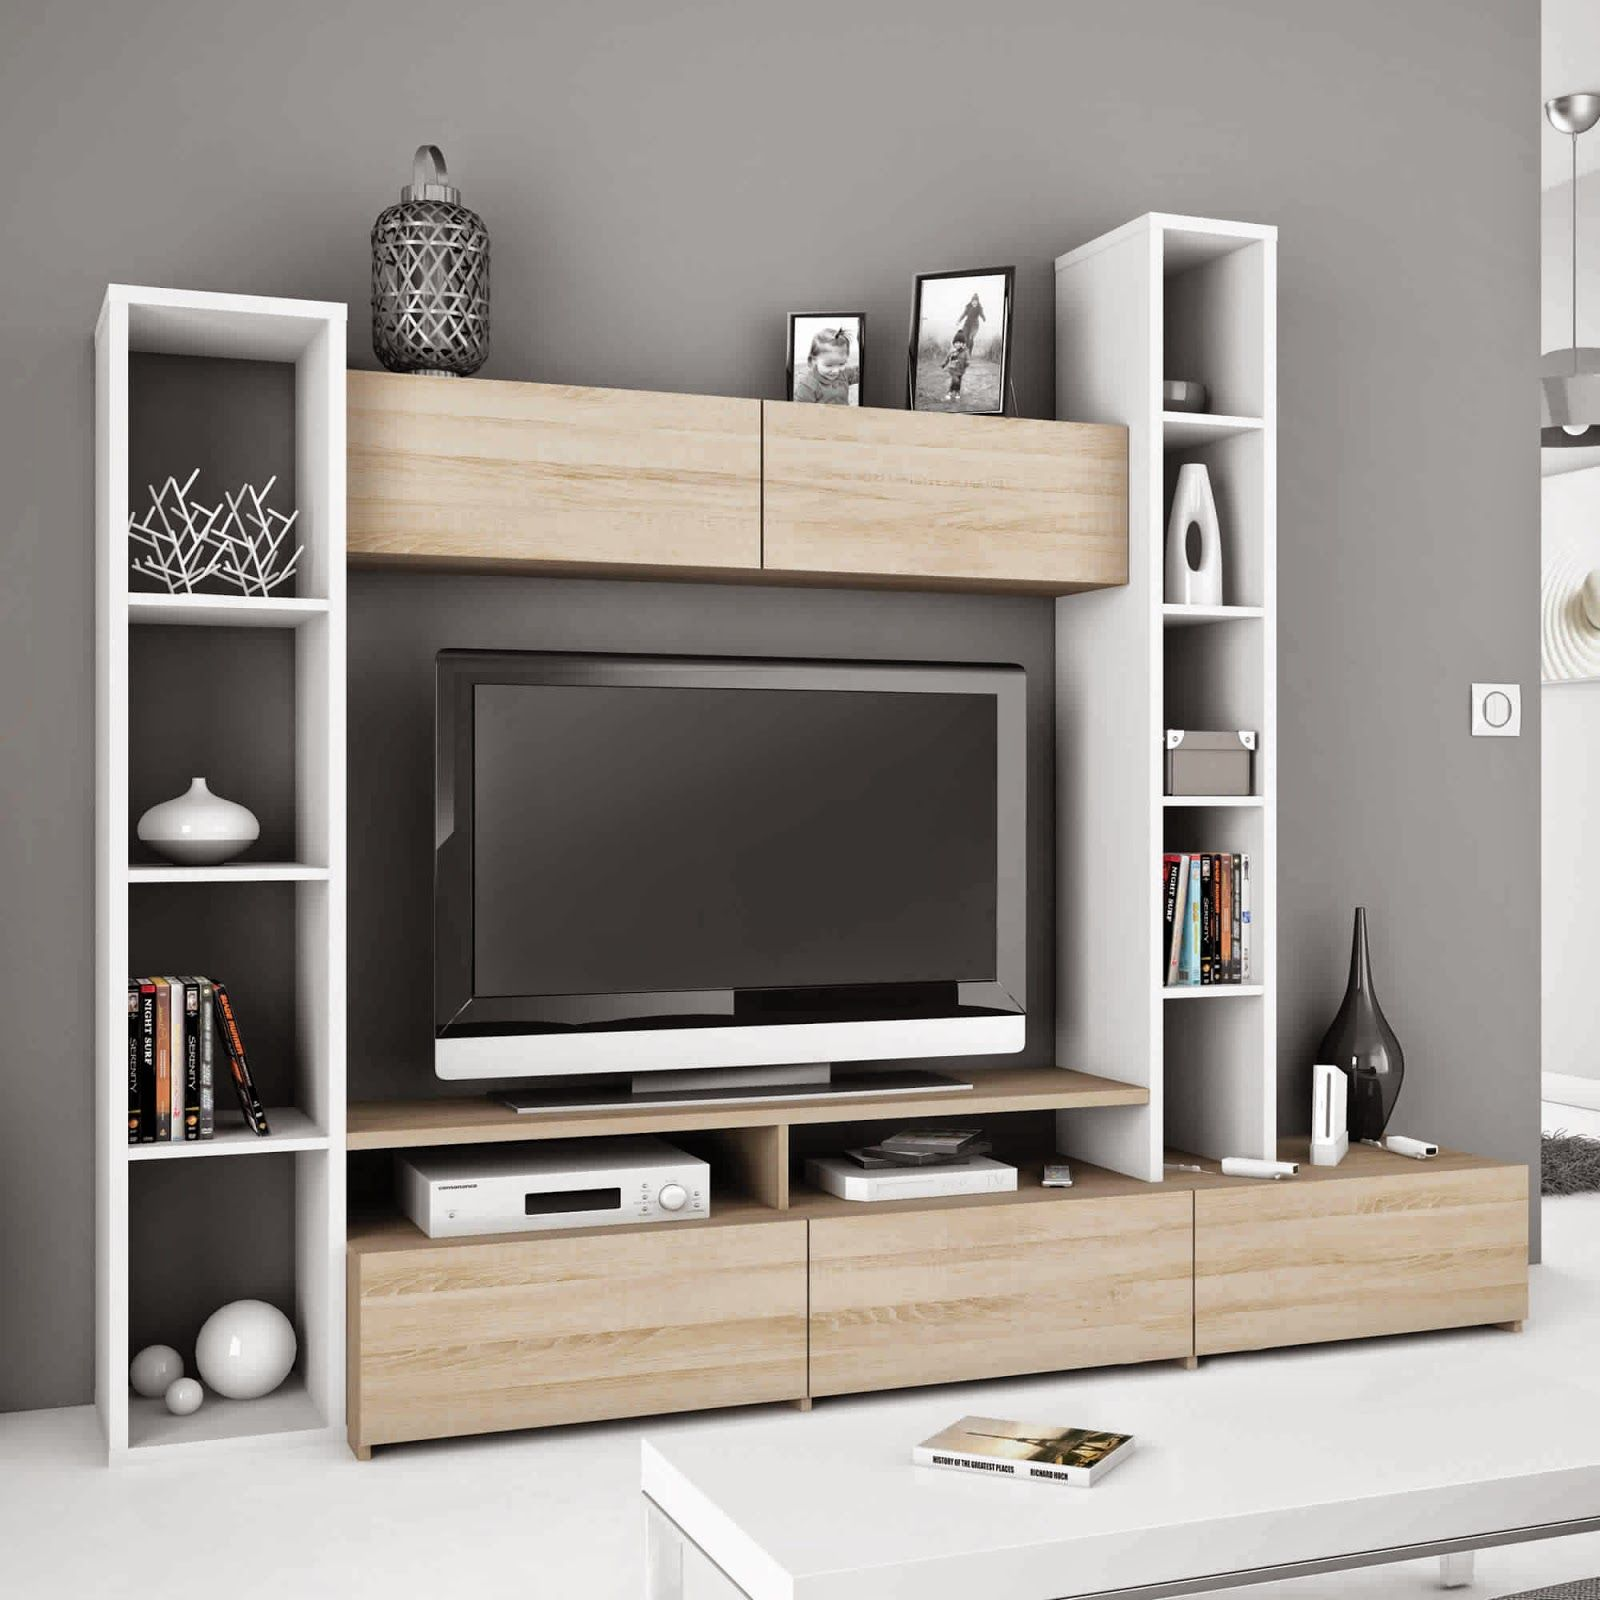 redoutable meuble tv rangement